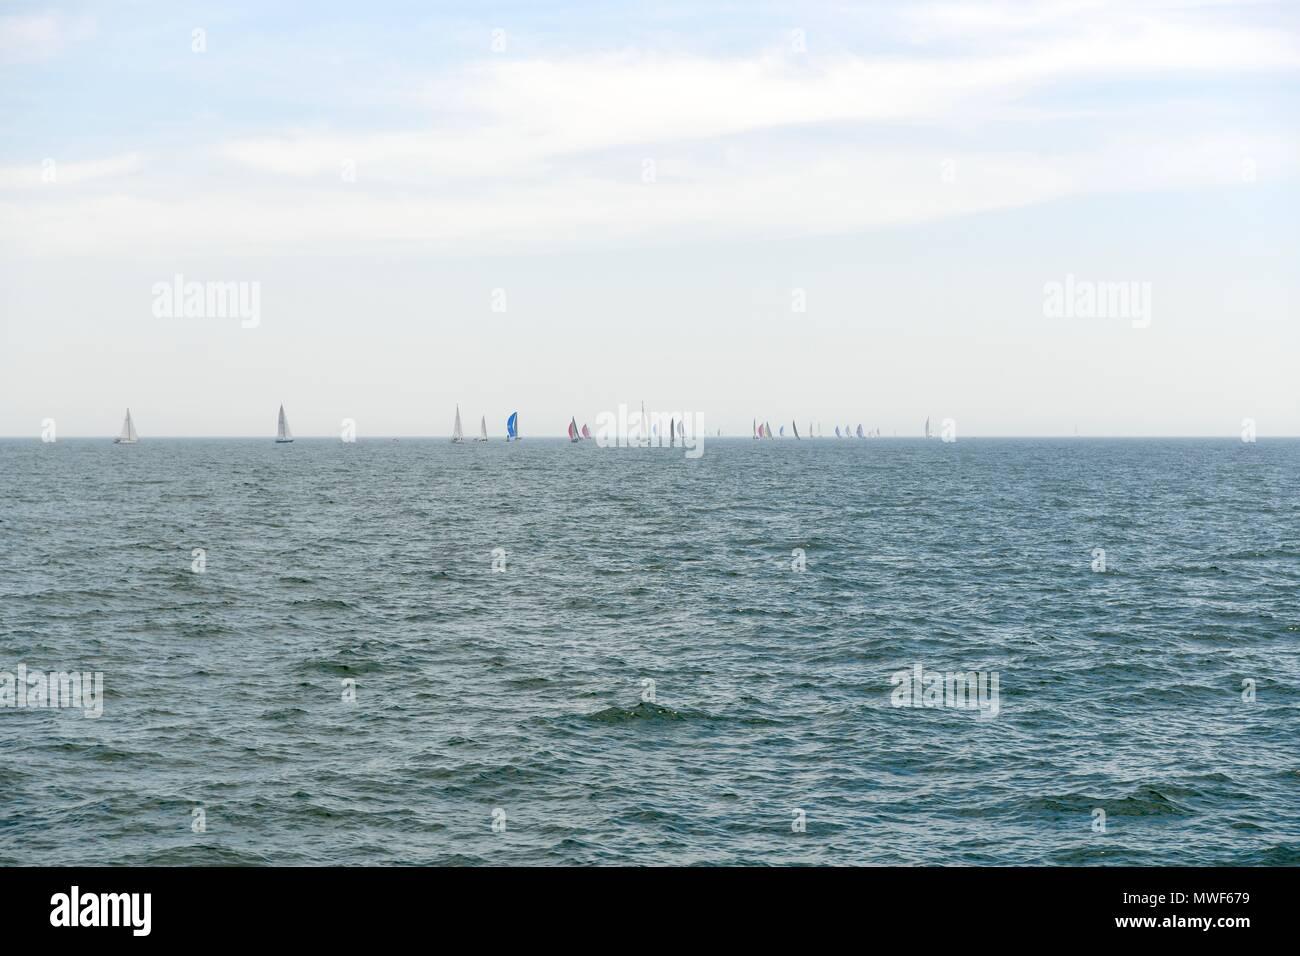 Sail boats in the Atlantic ocean off the coast of Martha's Vineyard, Massachusetts, USA - Stock Image